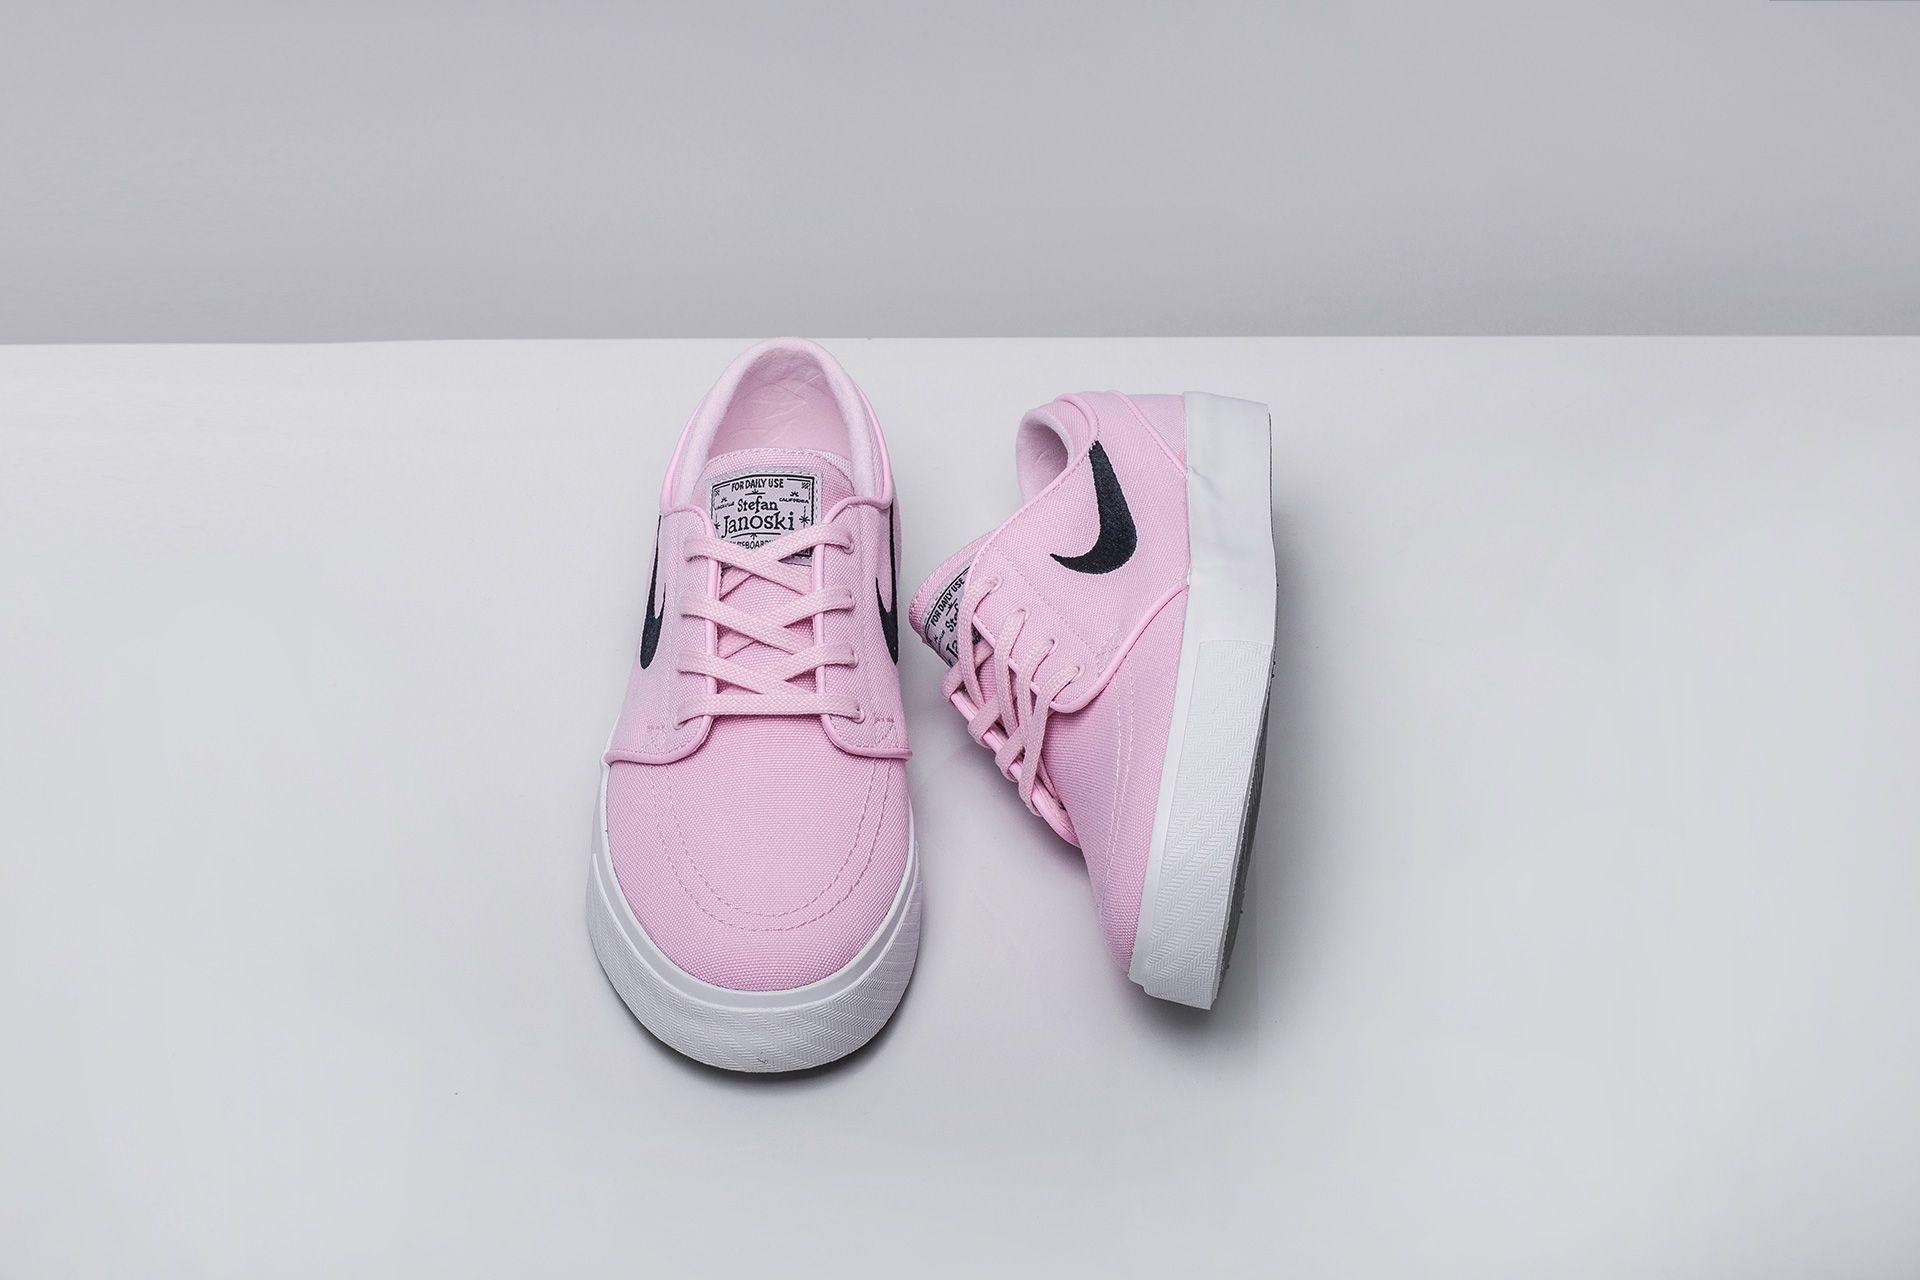 cheap for discount 3c2b4 1f00d ... Купить розовые кроссовки Nike SB Zoom Stefan Janoski CNVS - фото 2  картинки ...